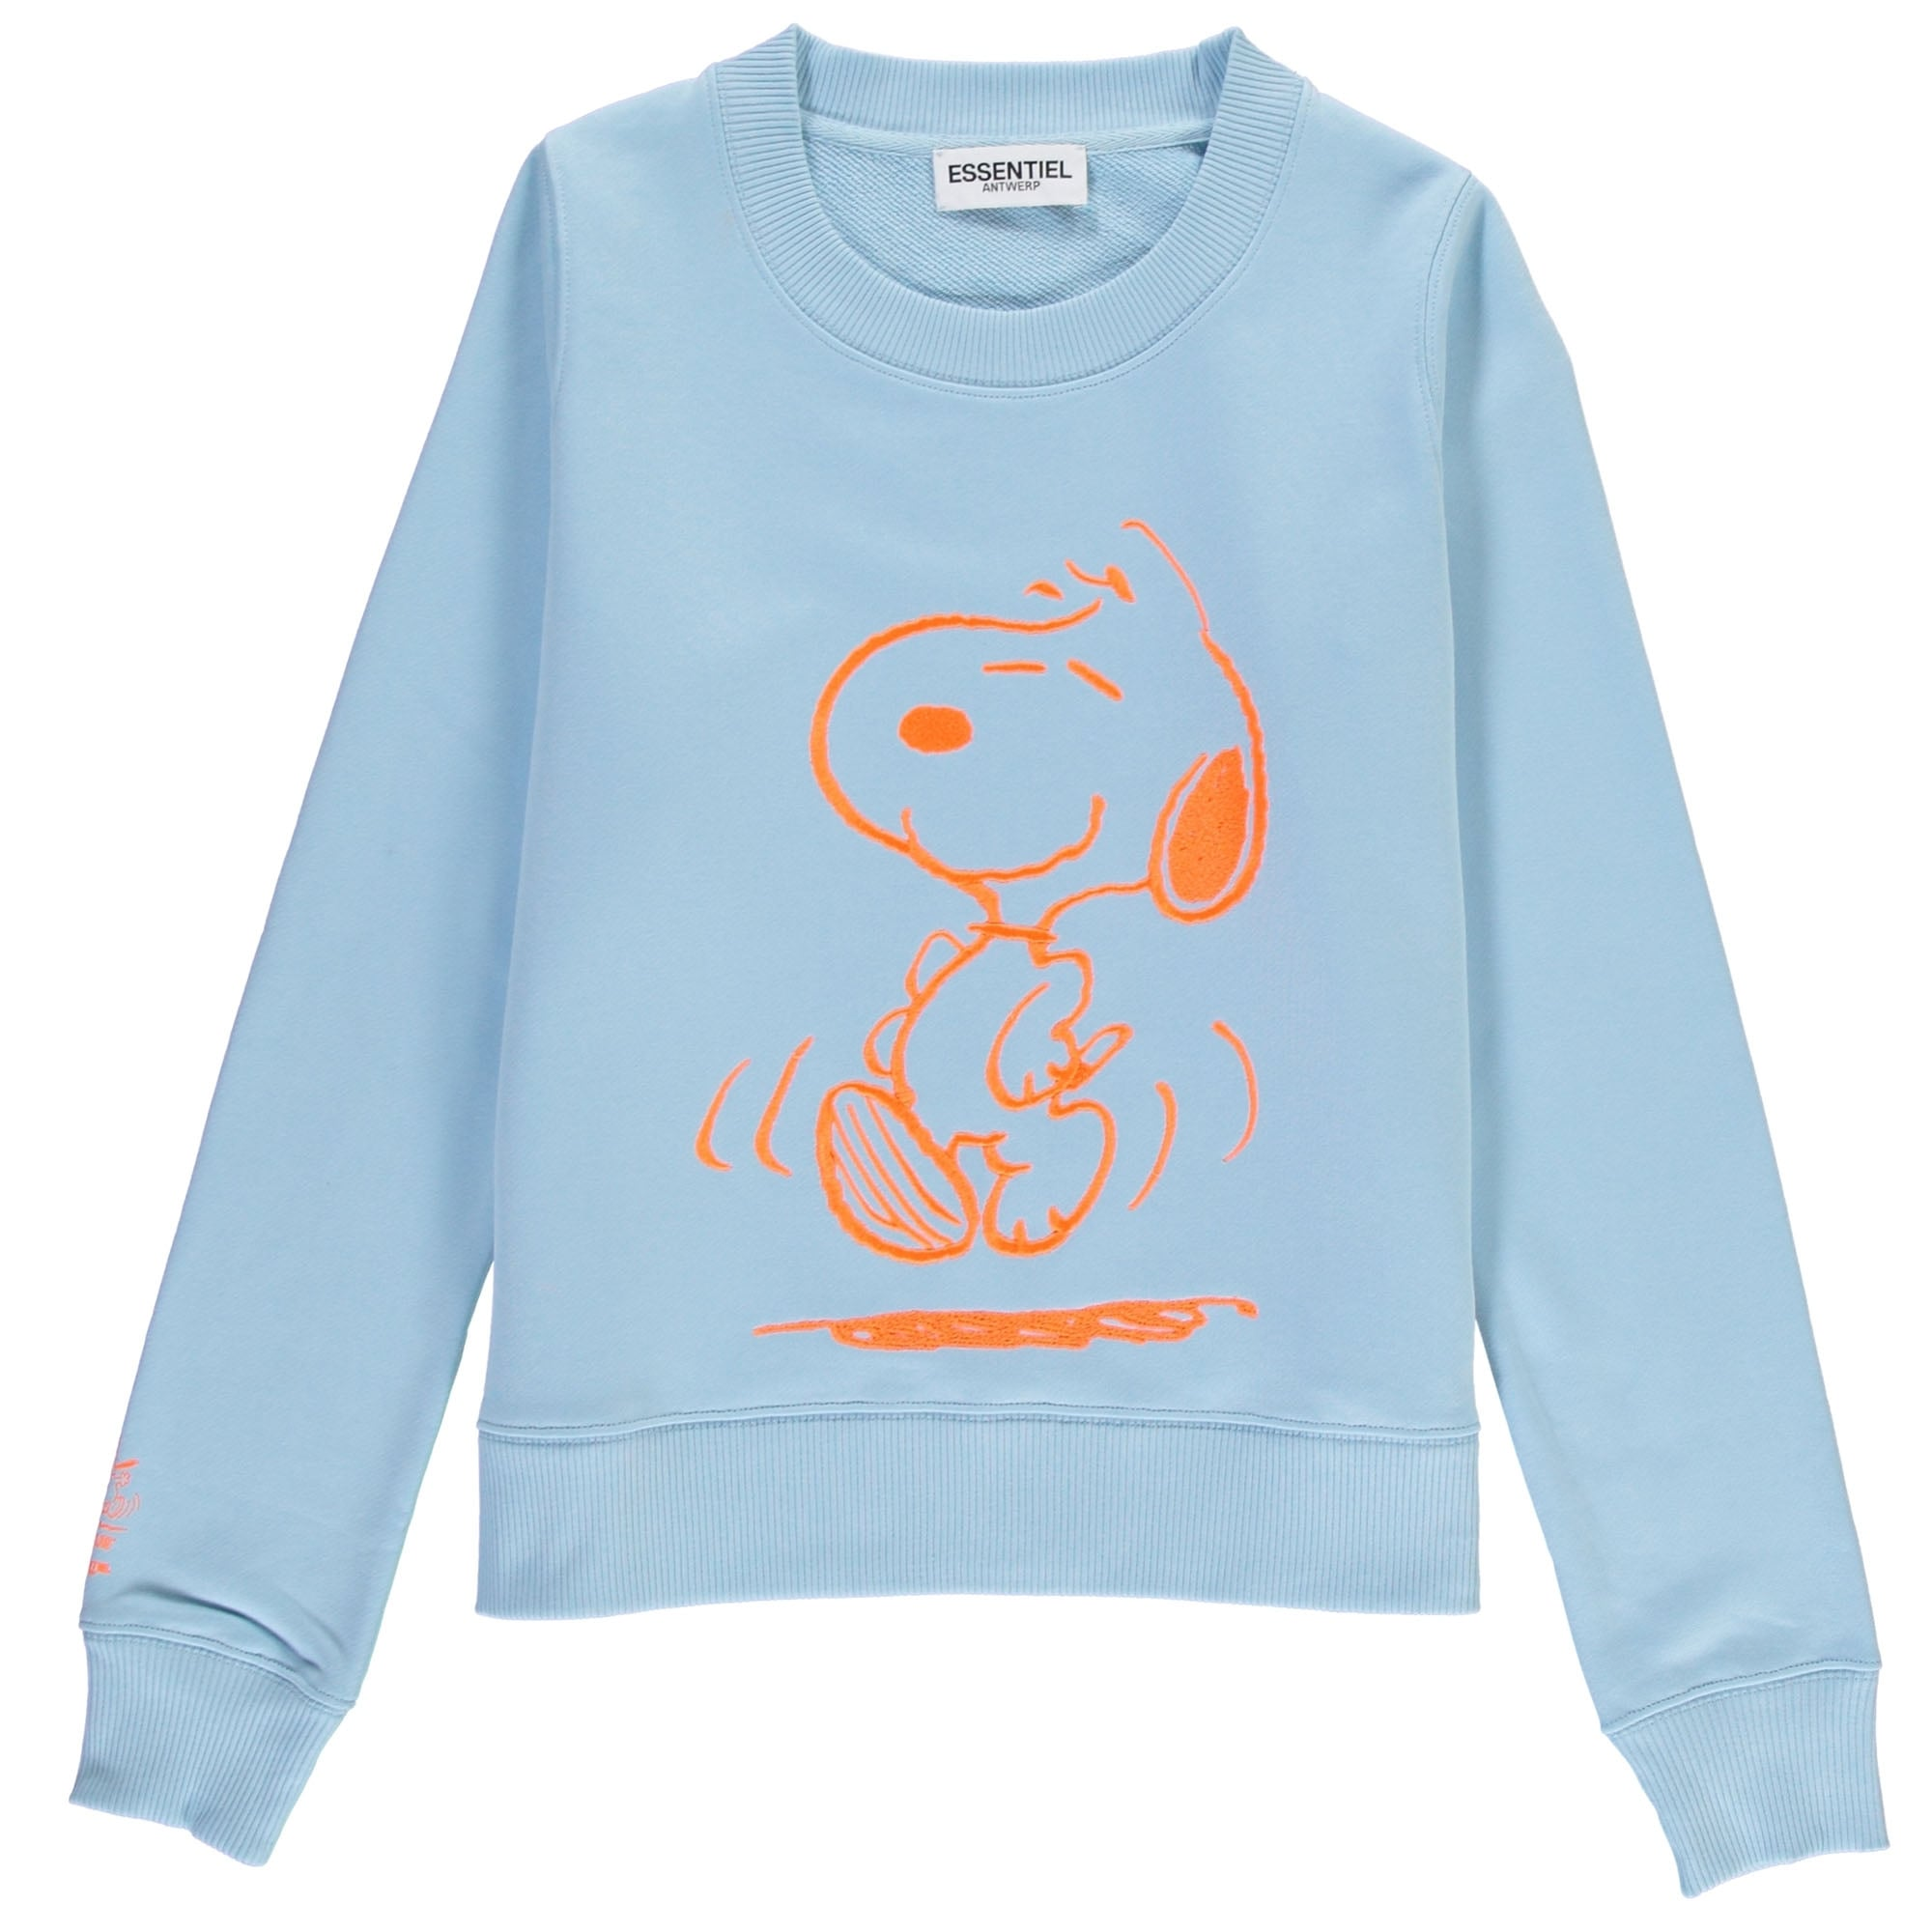 My Summertime Dance Snoopy Sweatshirt in Baby Blue